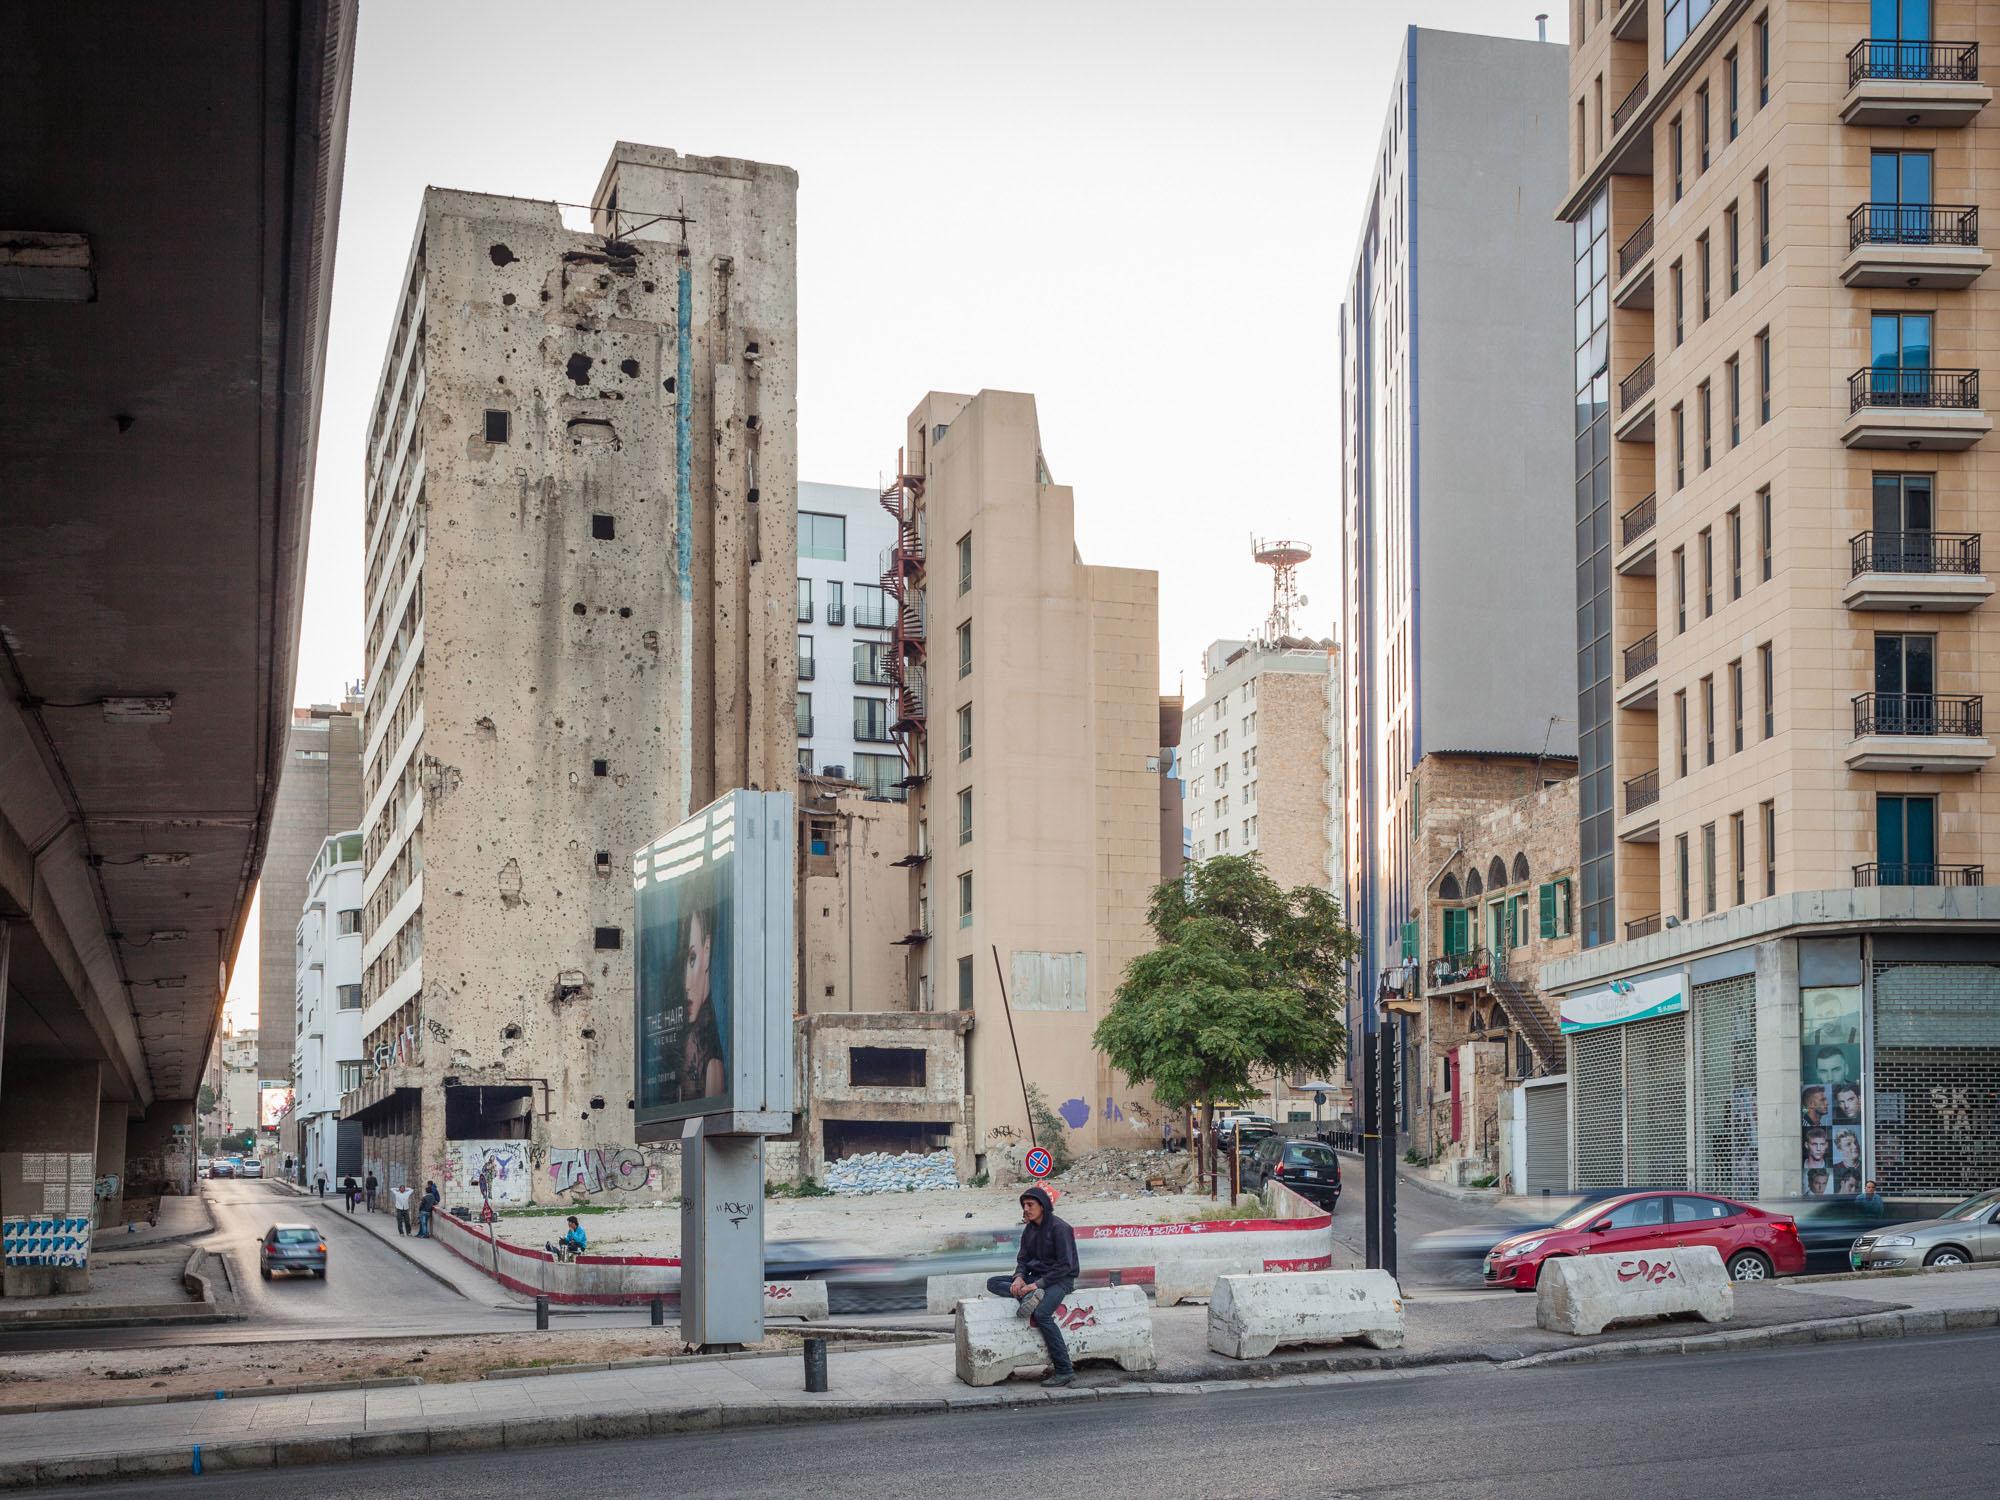 Beirut-7523.jpg